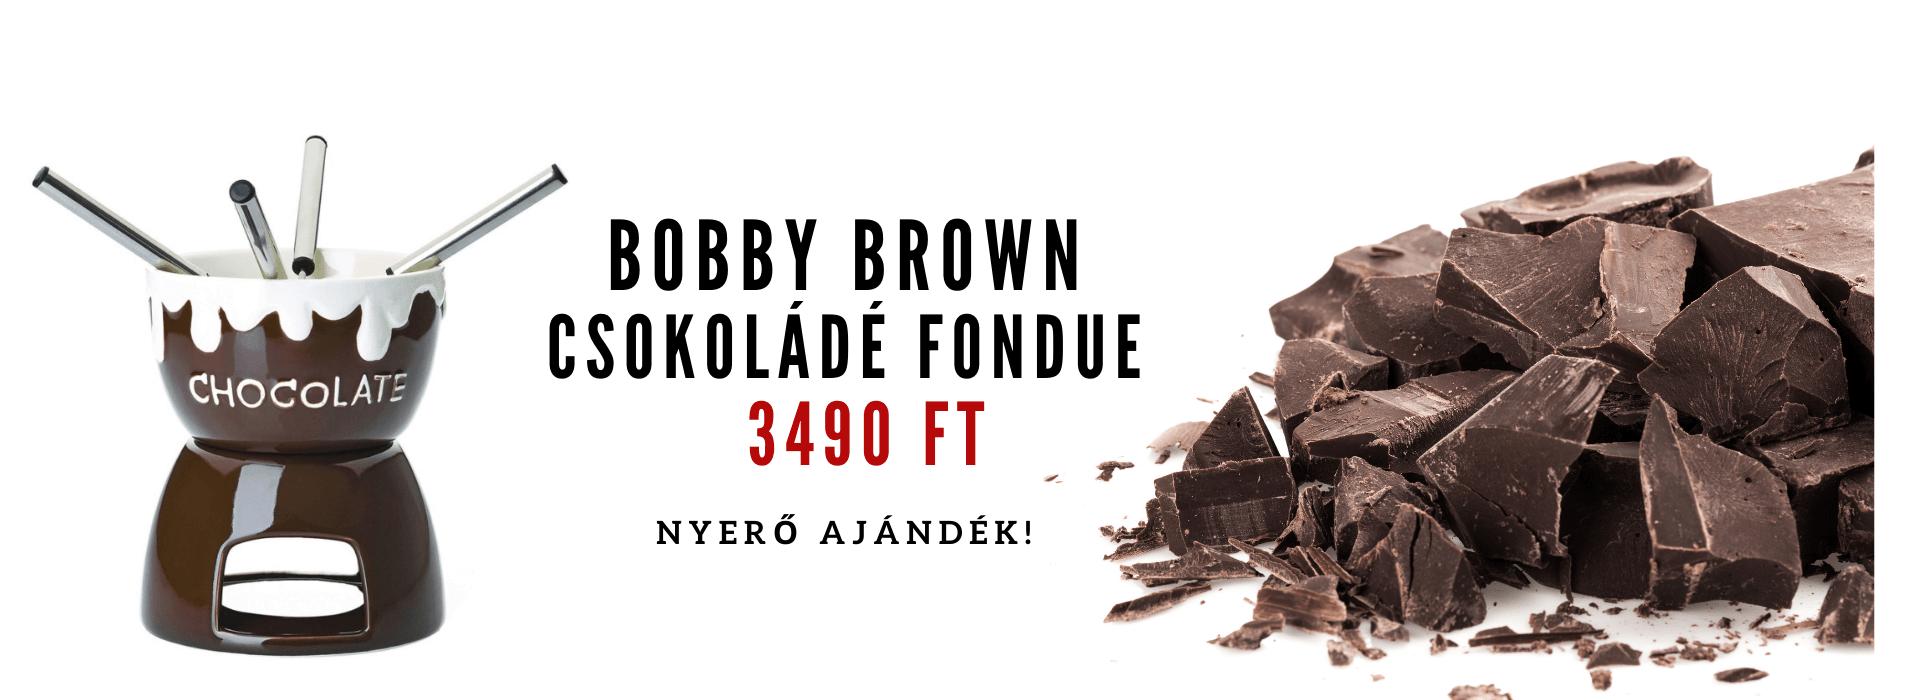 Dropshippy_Katalogus_Bobby_Brown_csoki_fondue